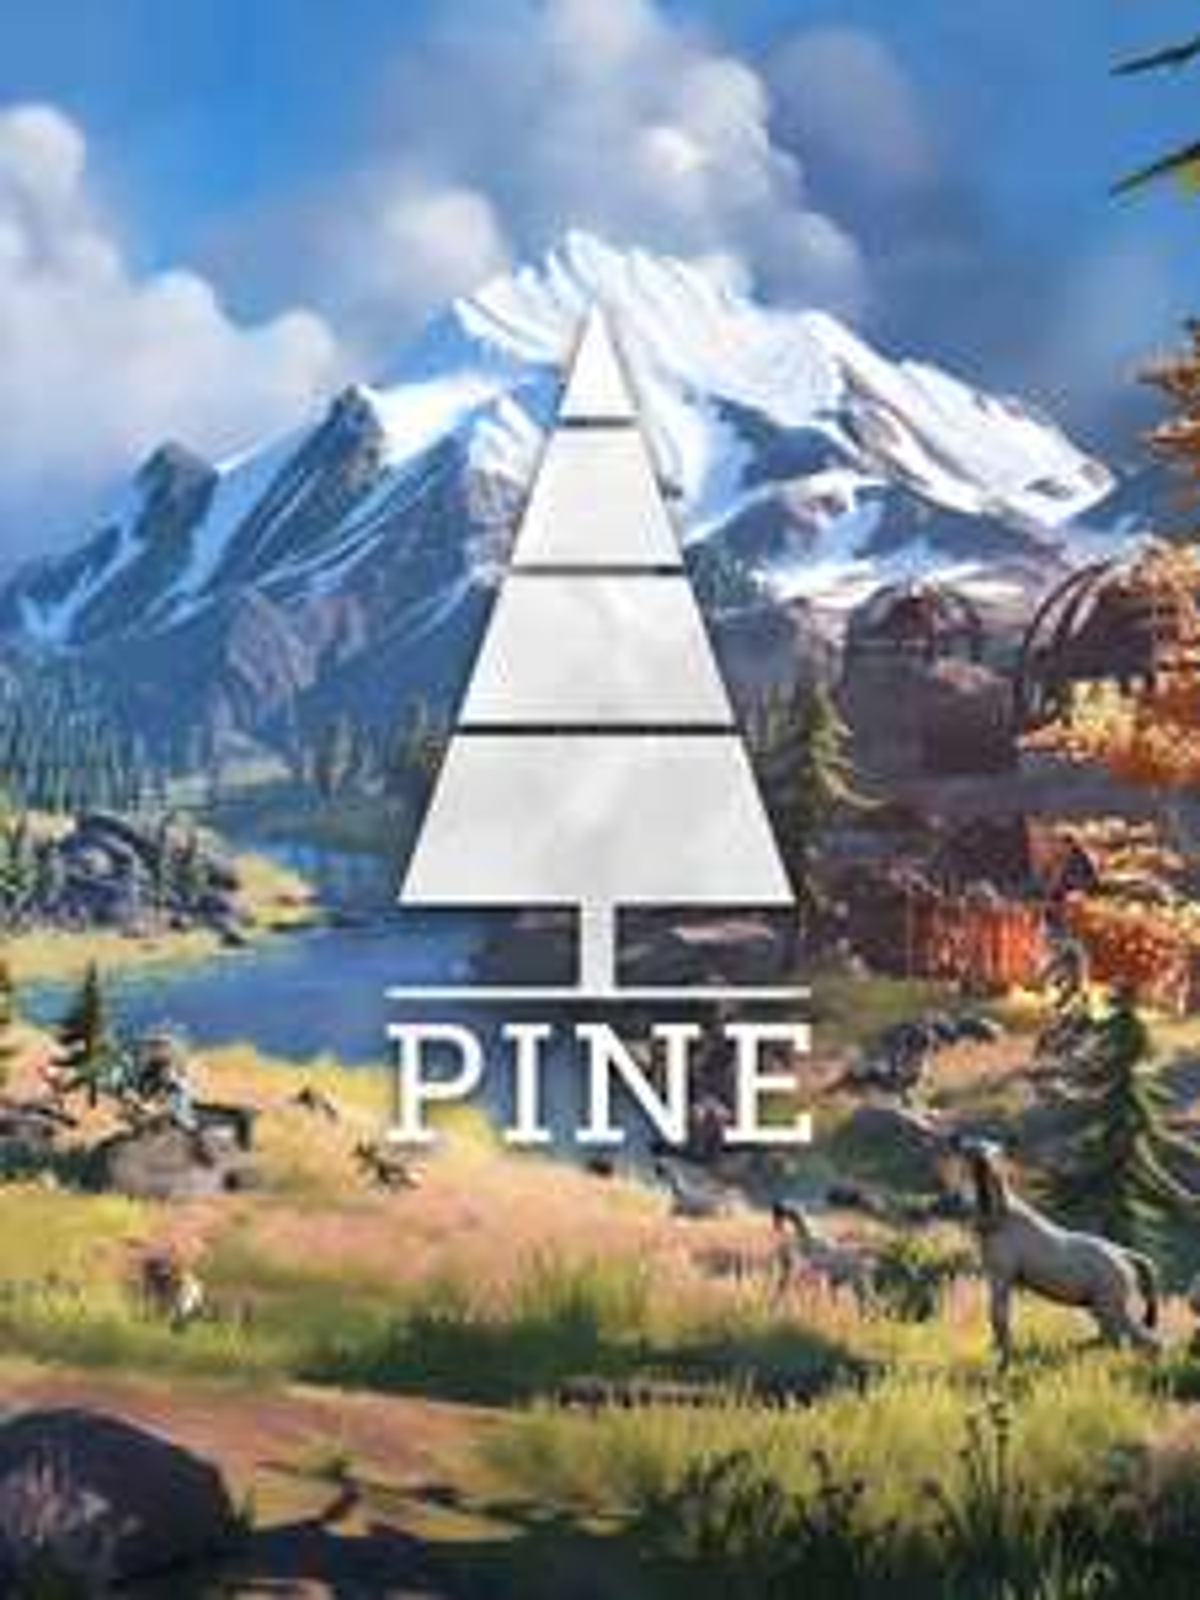 [GRATIS] Pine @EPIC GAMES (Vanaf 6 mei tot 13 mei)